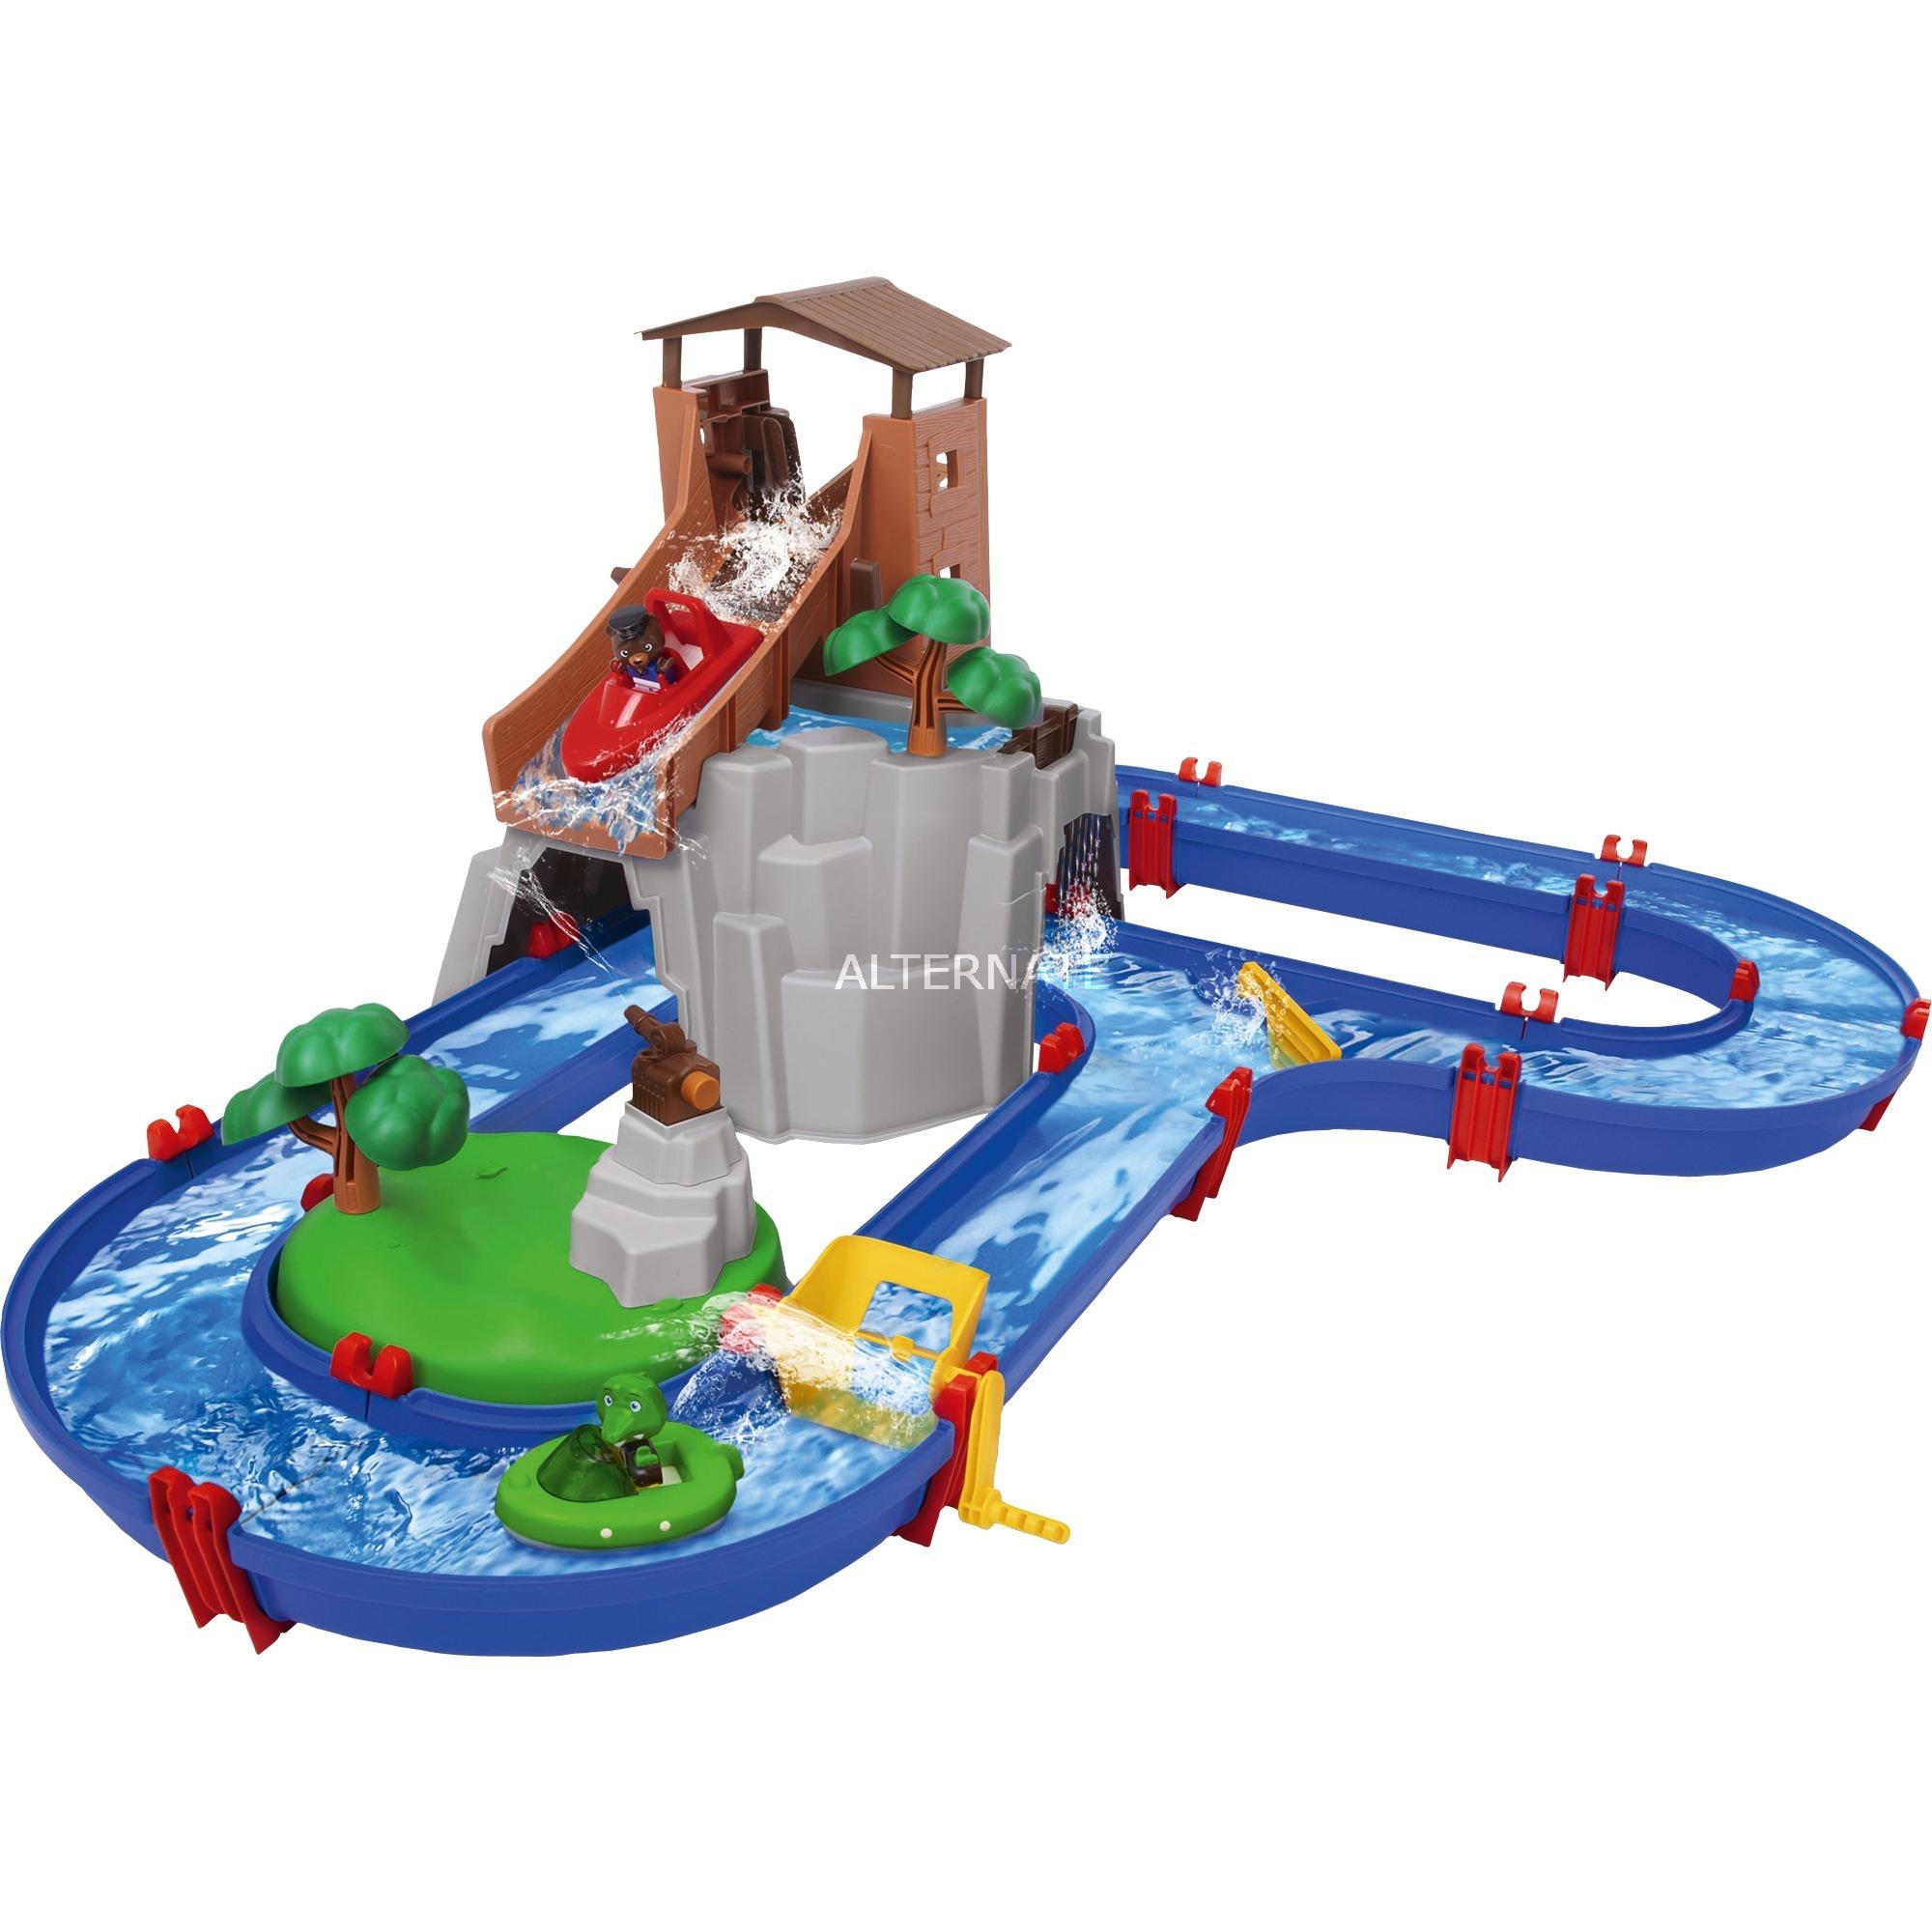 Image of AdventureLand, Wasserspielzeug